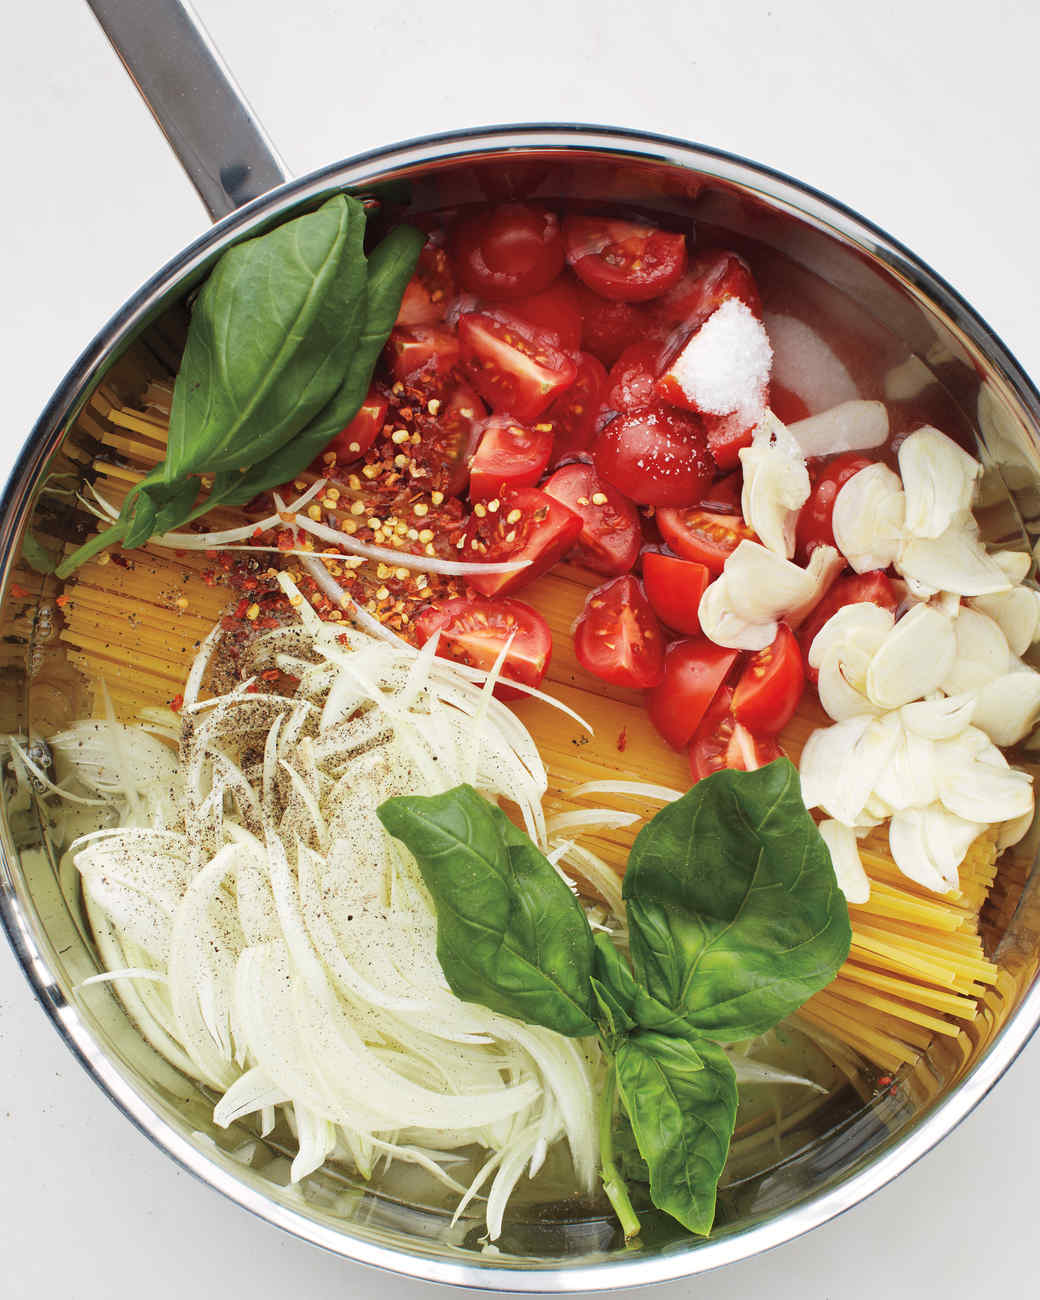 msl-kitchen-spaghetti-0131-md110059.jpg